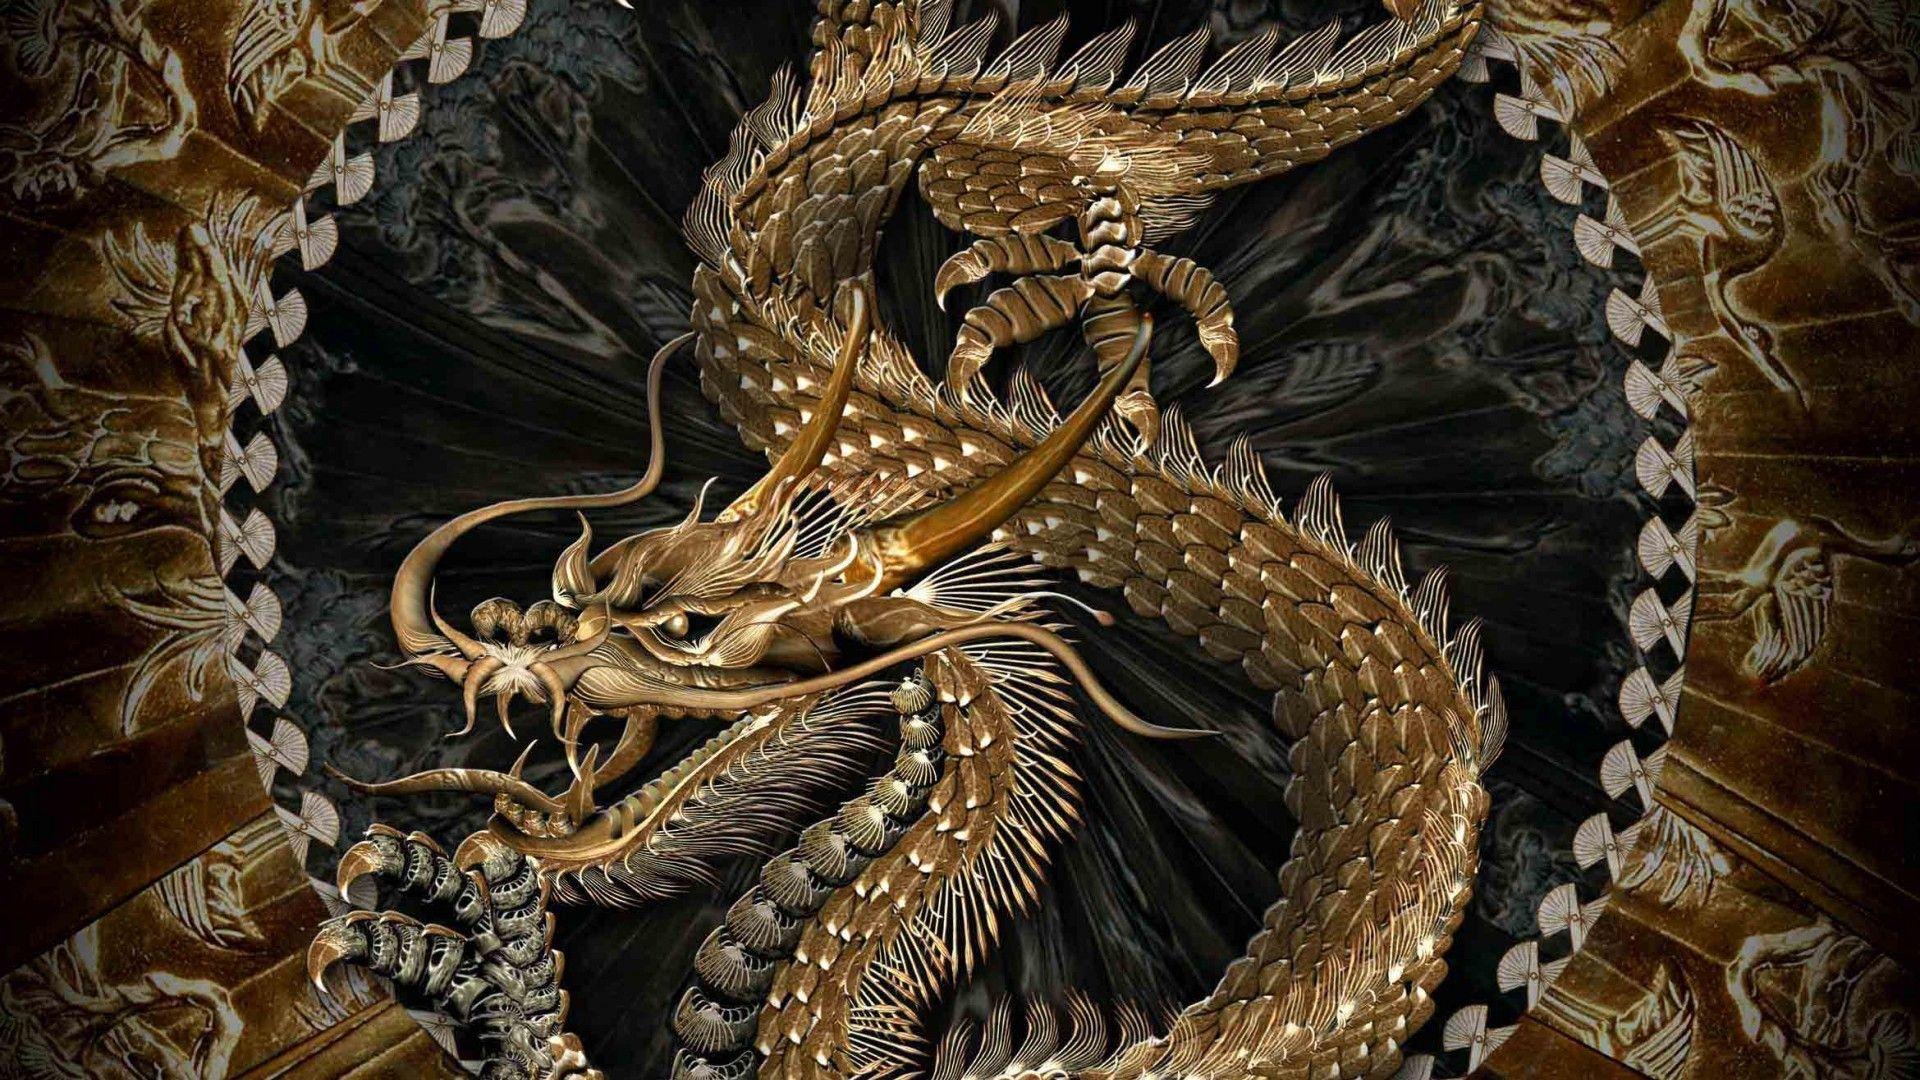 Pin By Casemodo On Digital Art Dragon Pictures Japanese Dragon Dragon Artwork